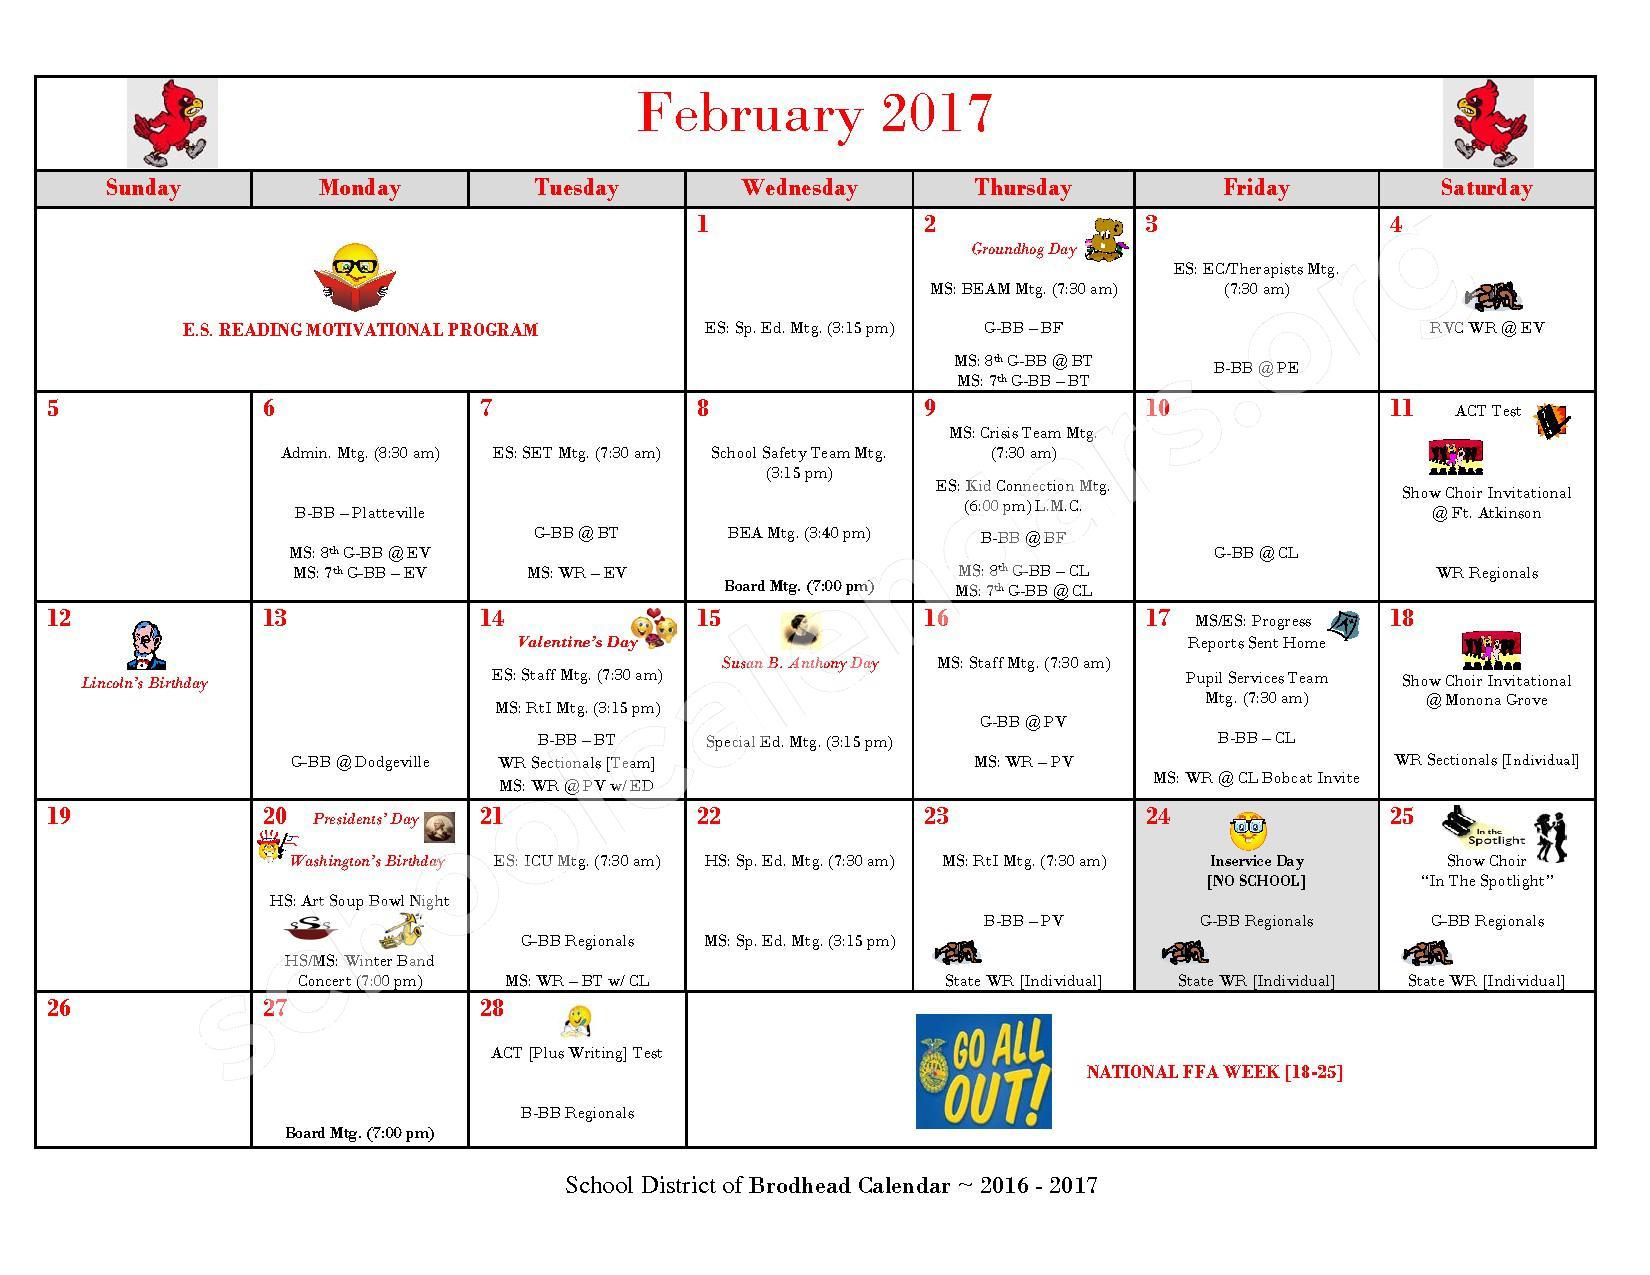 2016 - 2017 School Calendar – Brodhead School District – page 7